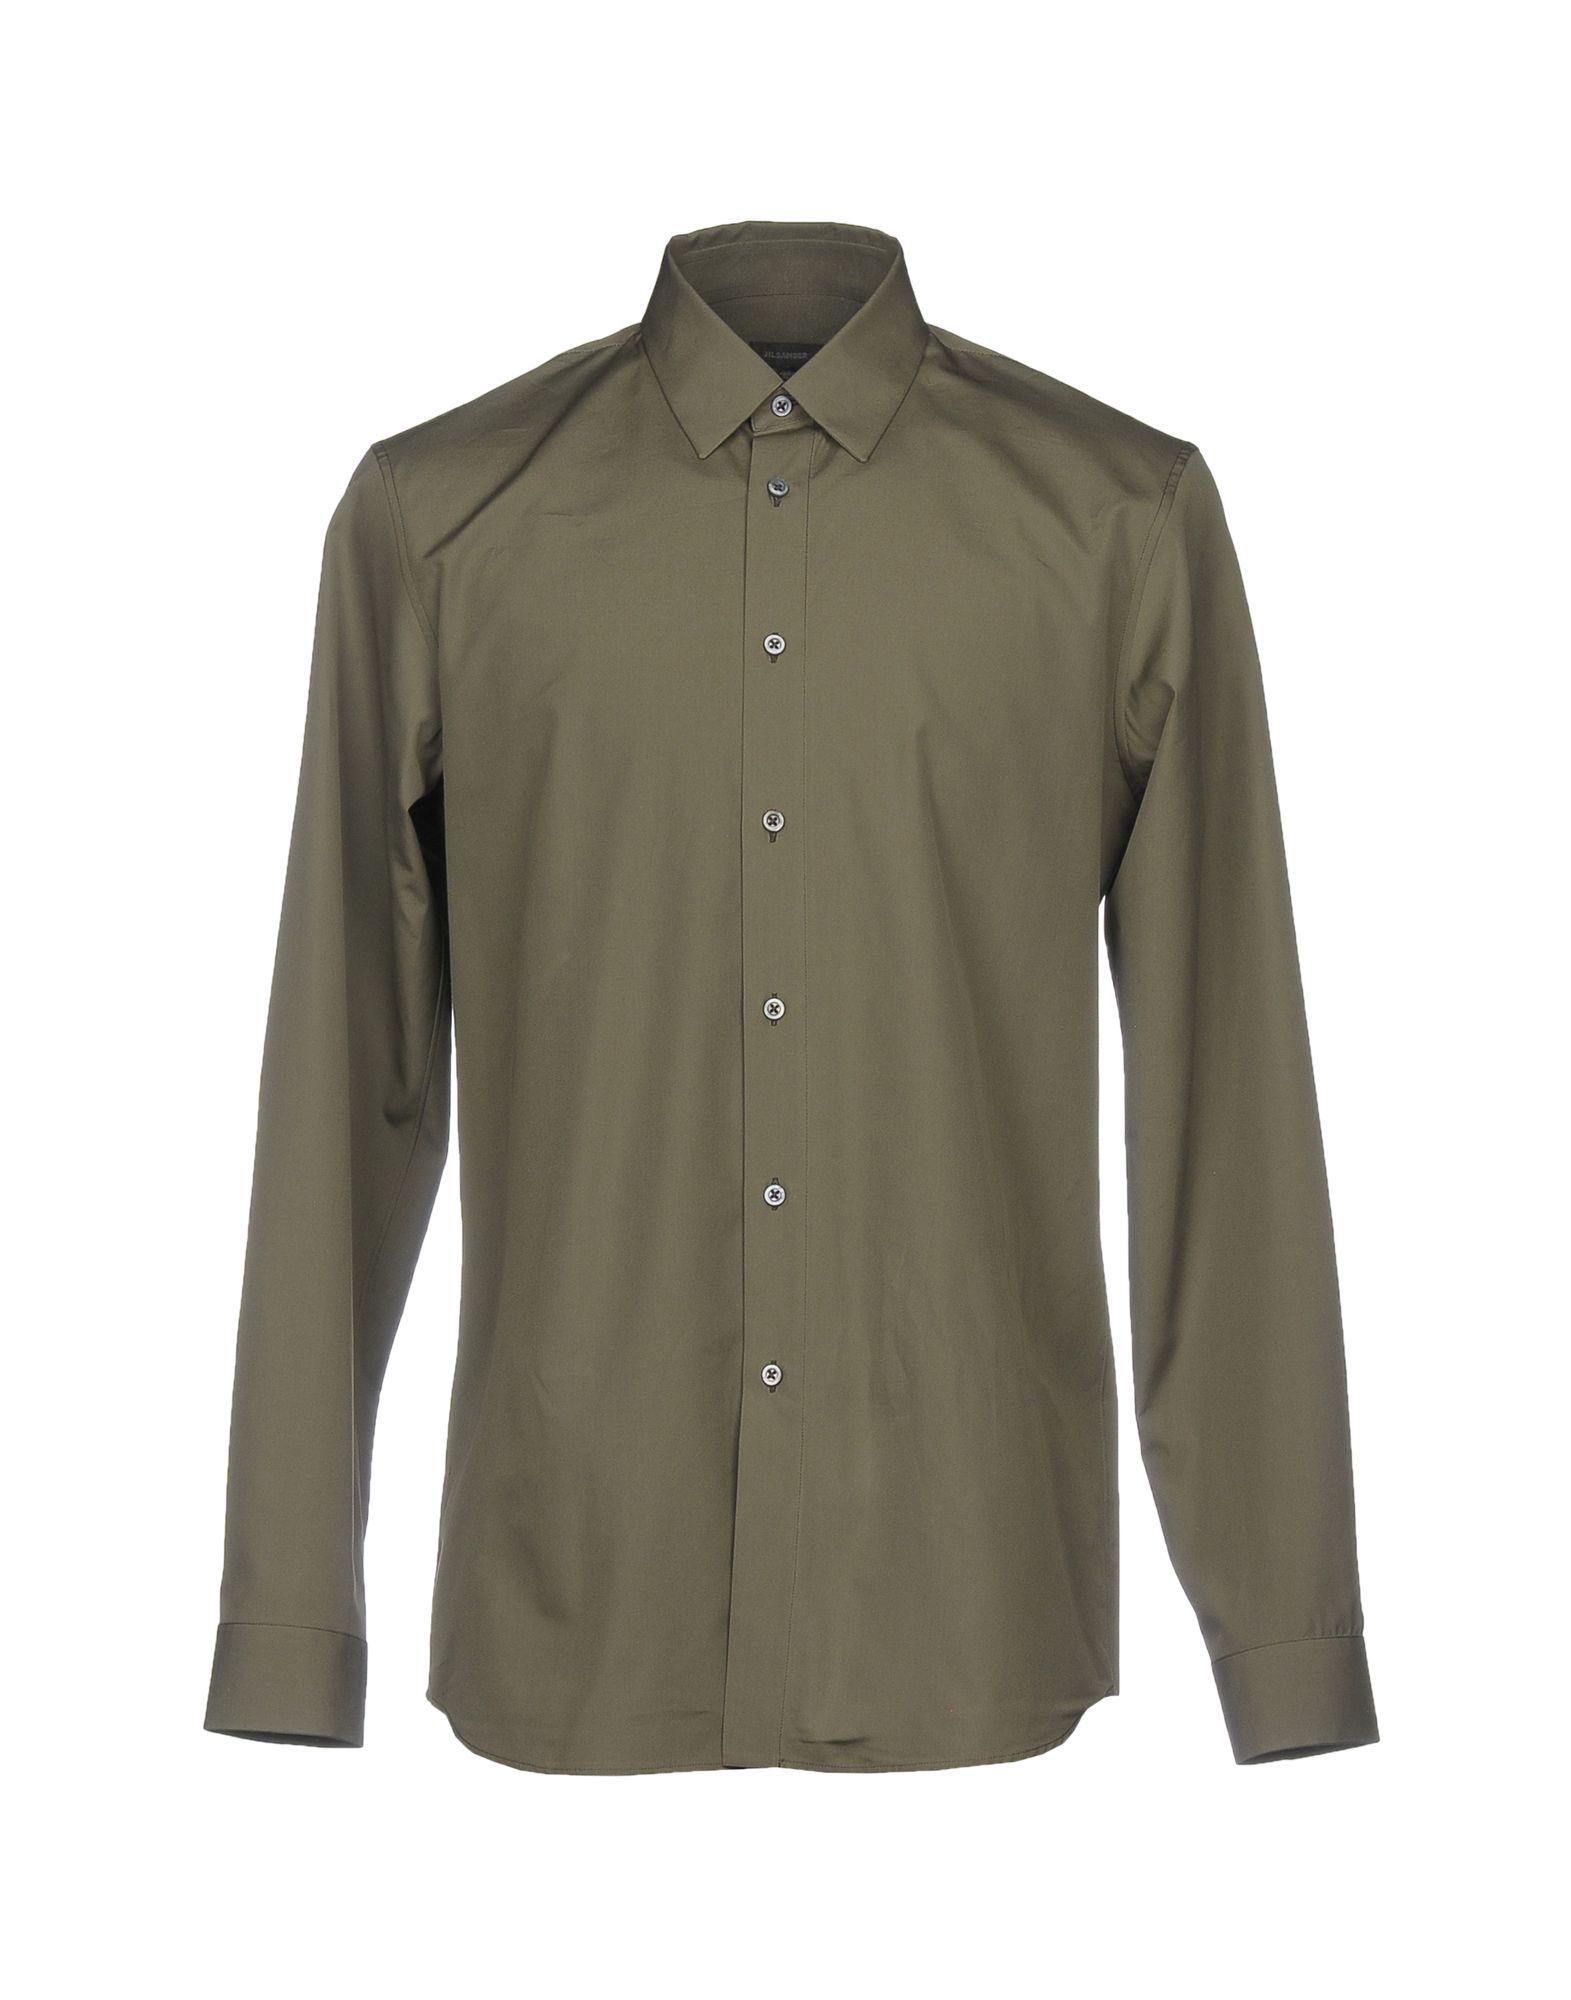 Jil Sander Grey Cotton Shirt